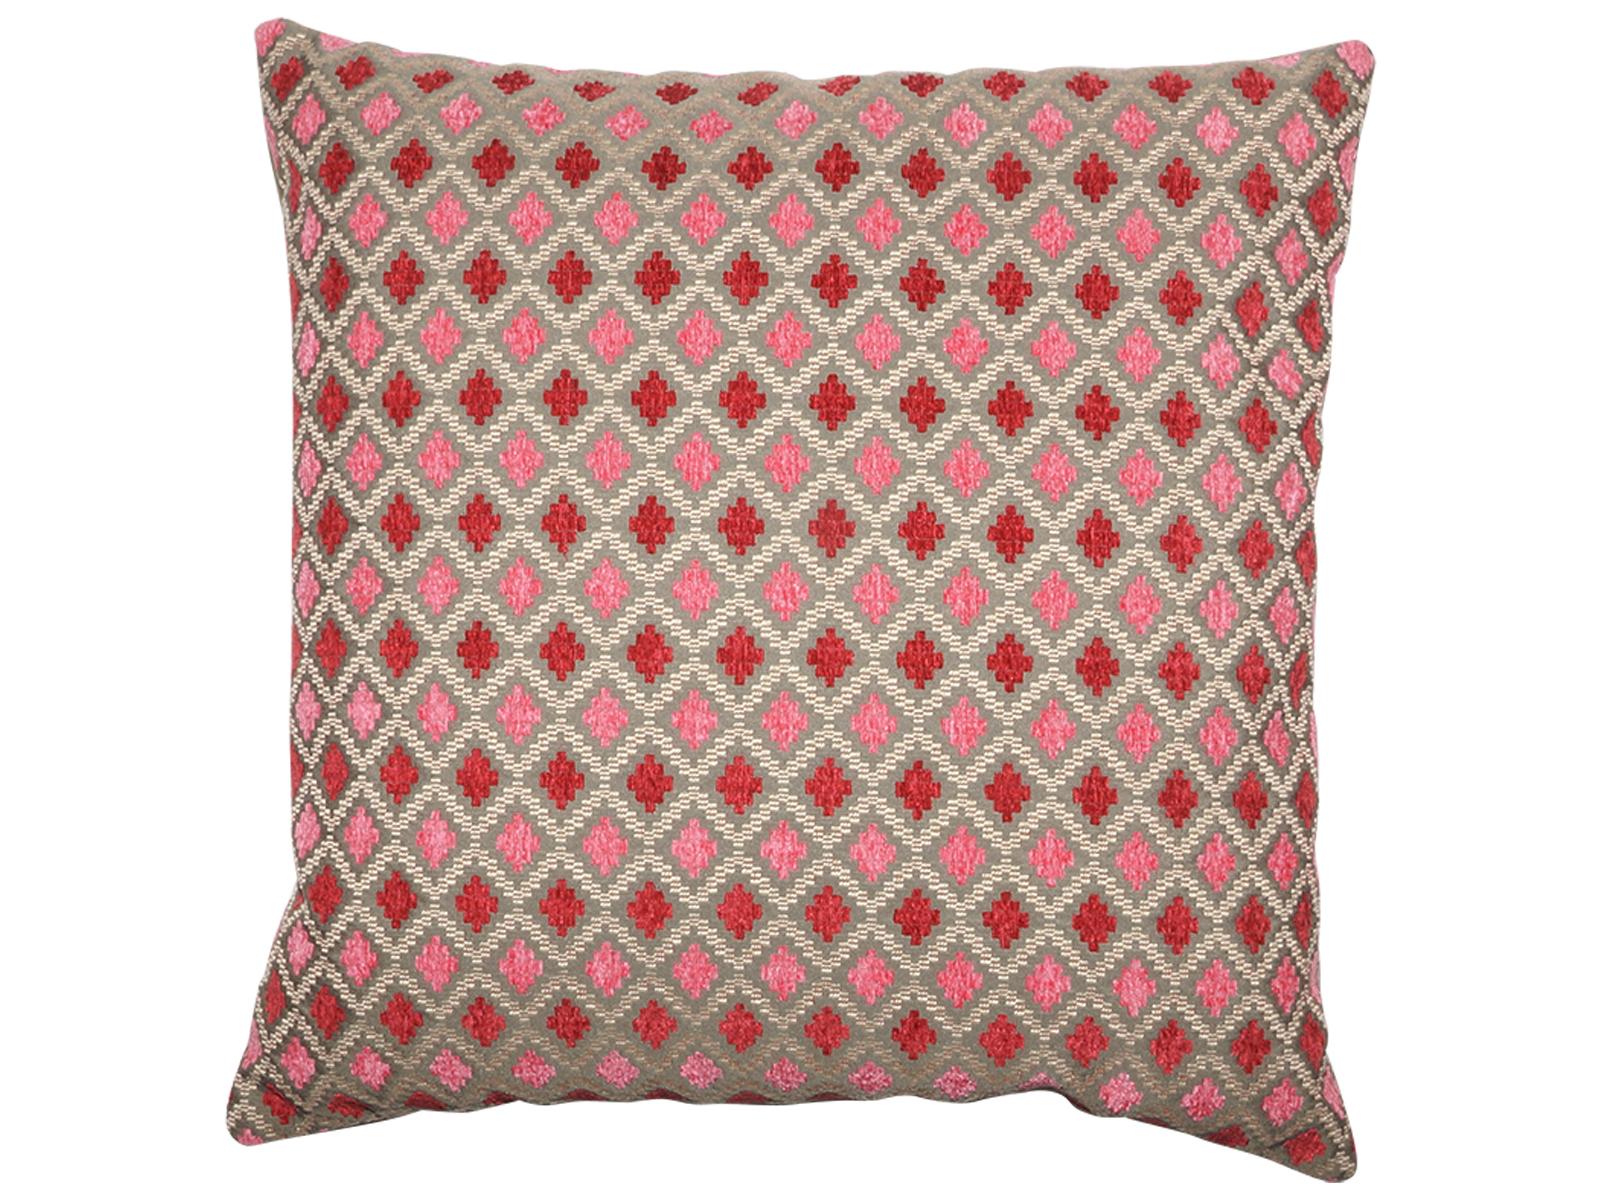 Подушка ScandinaviaДекоративные подушки<br>Декоративная подушка со съемным чехлом<br>